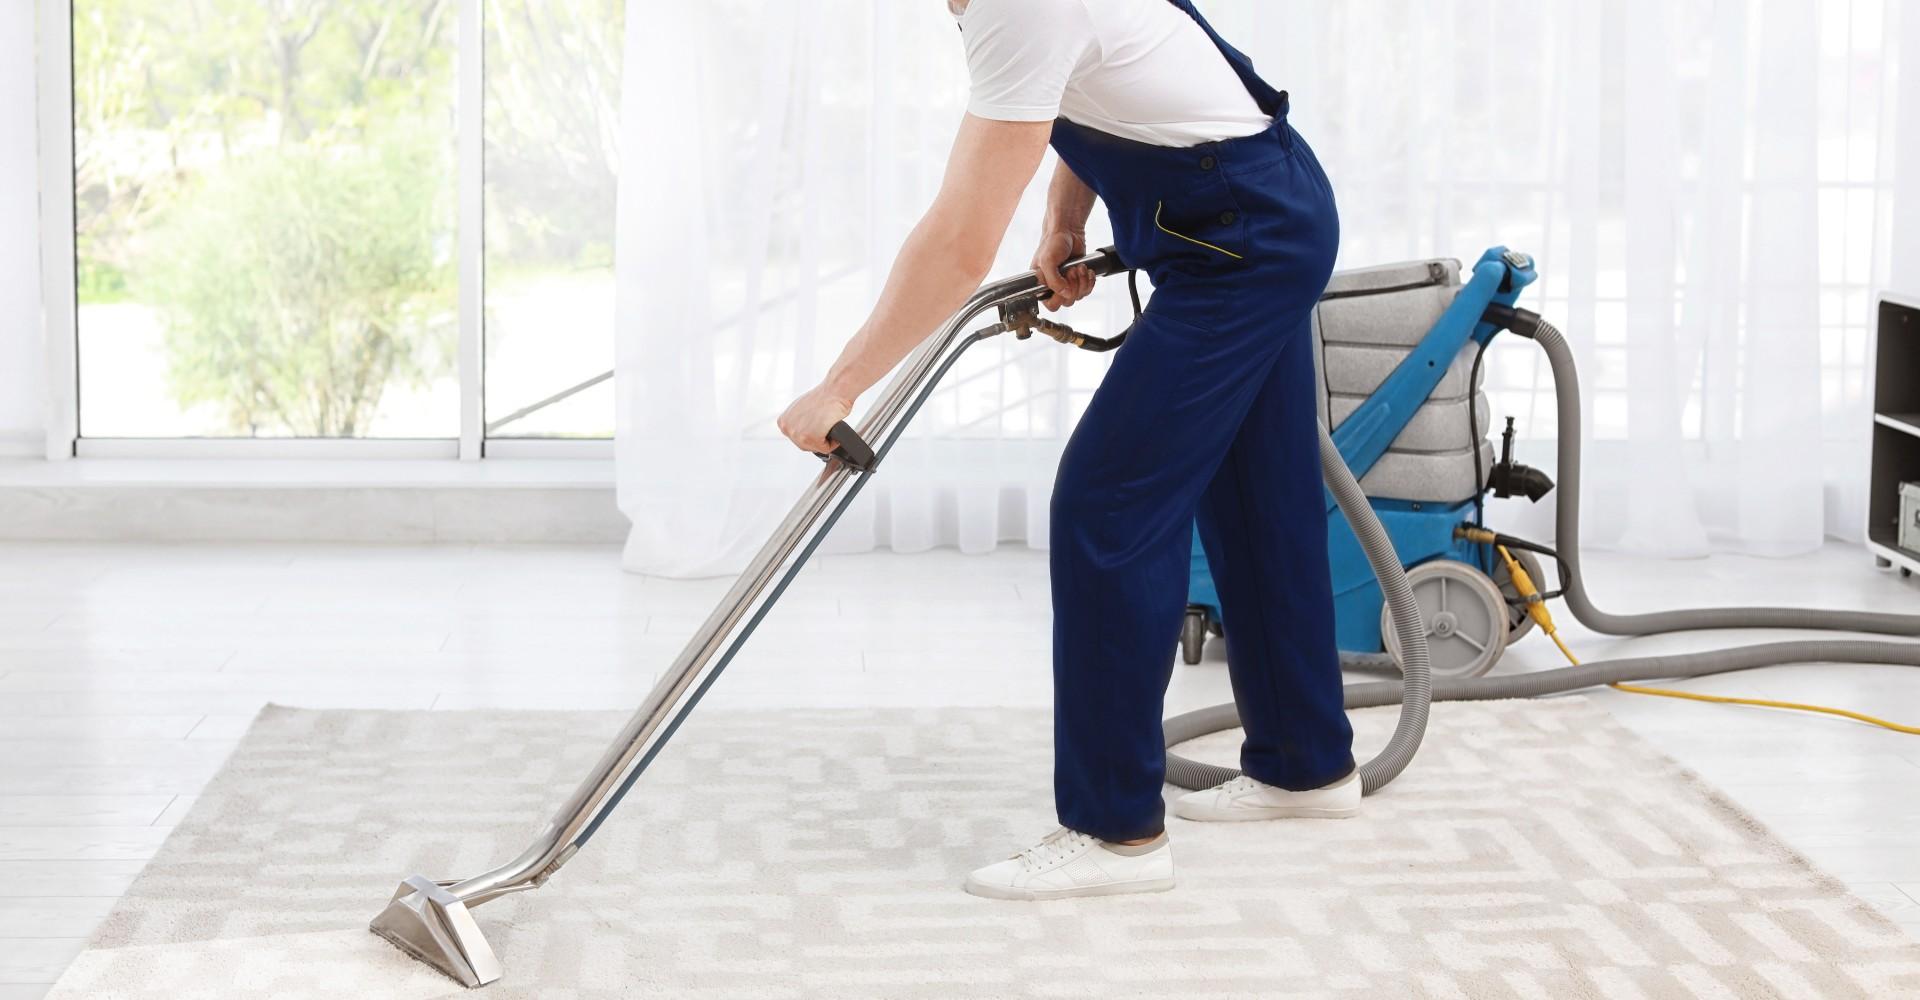 commercial carpet cleaner equipment